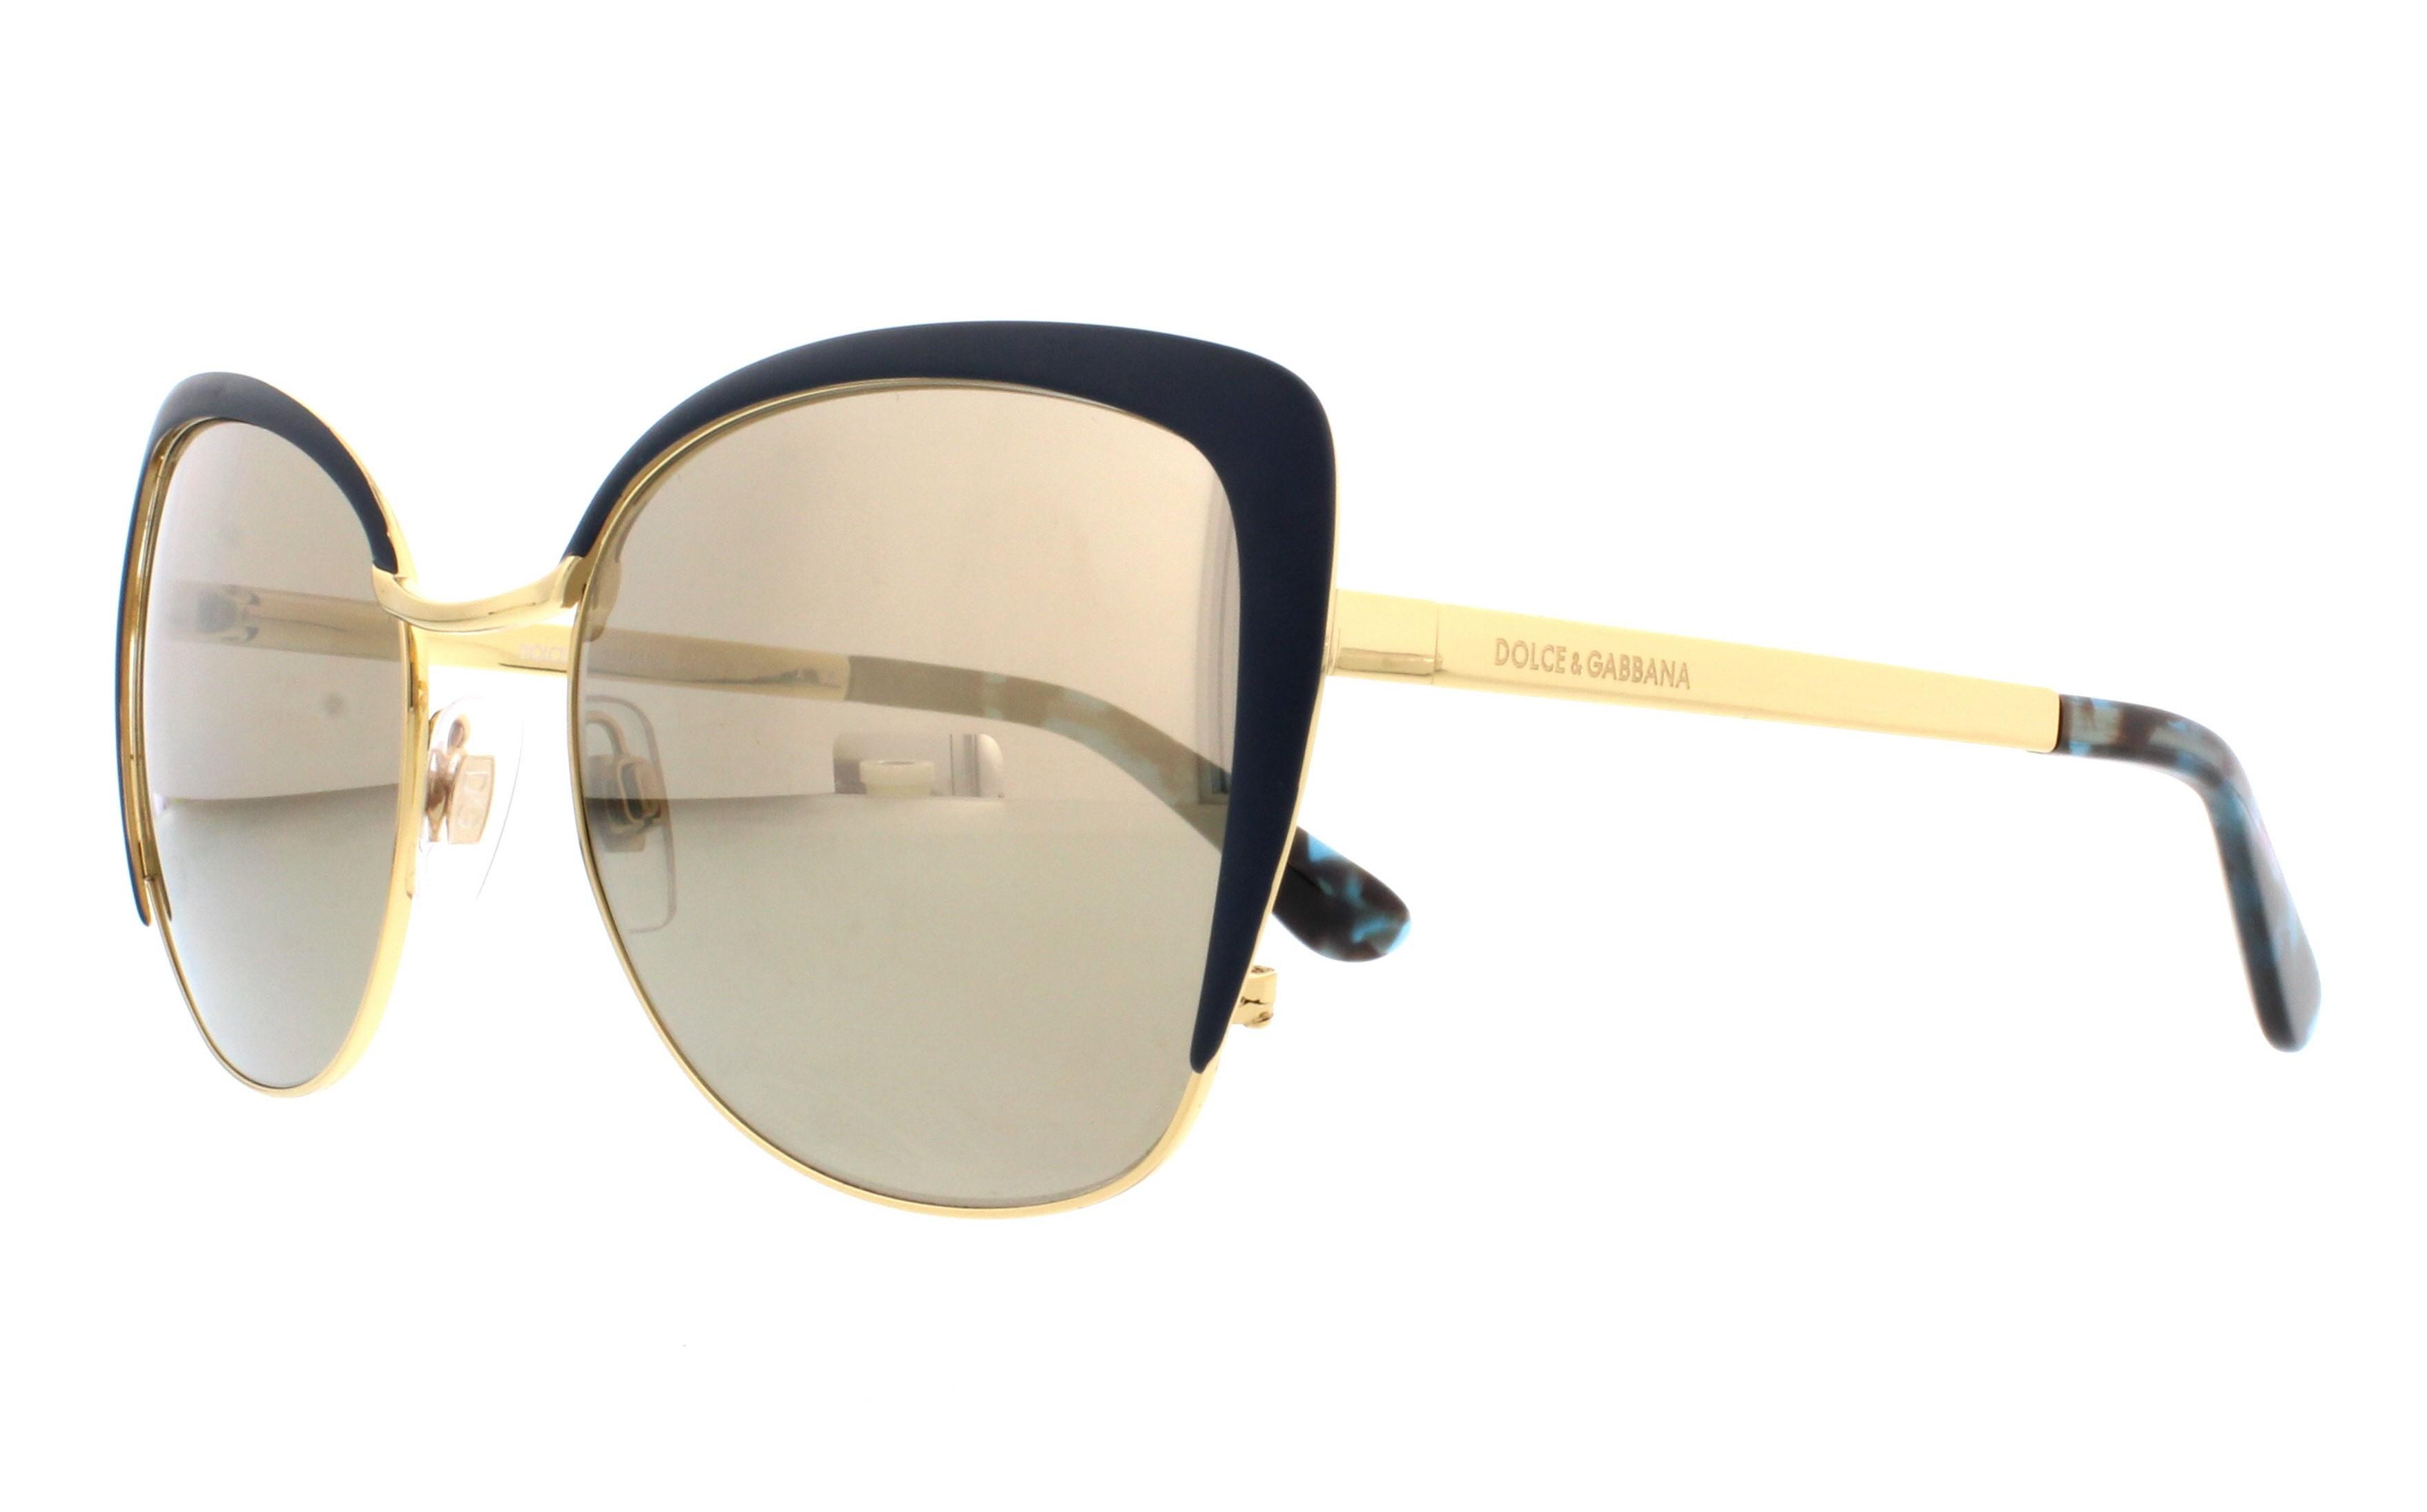 341340151242f DOLCE   GABBANA Sunglasses DG2143 02 6G Gold Petroleum 57MM ...